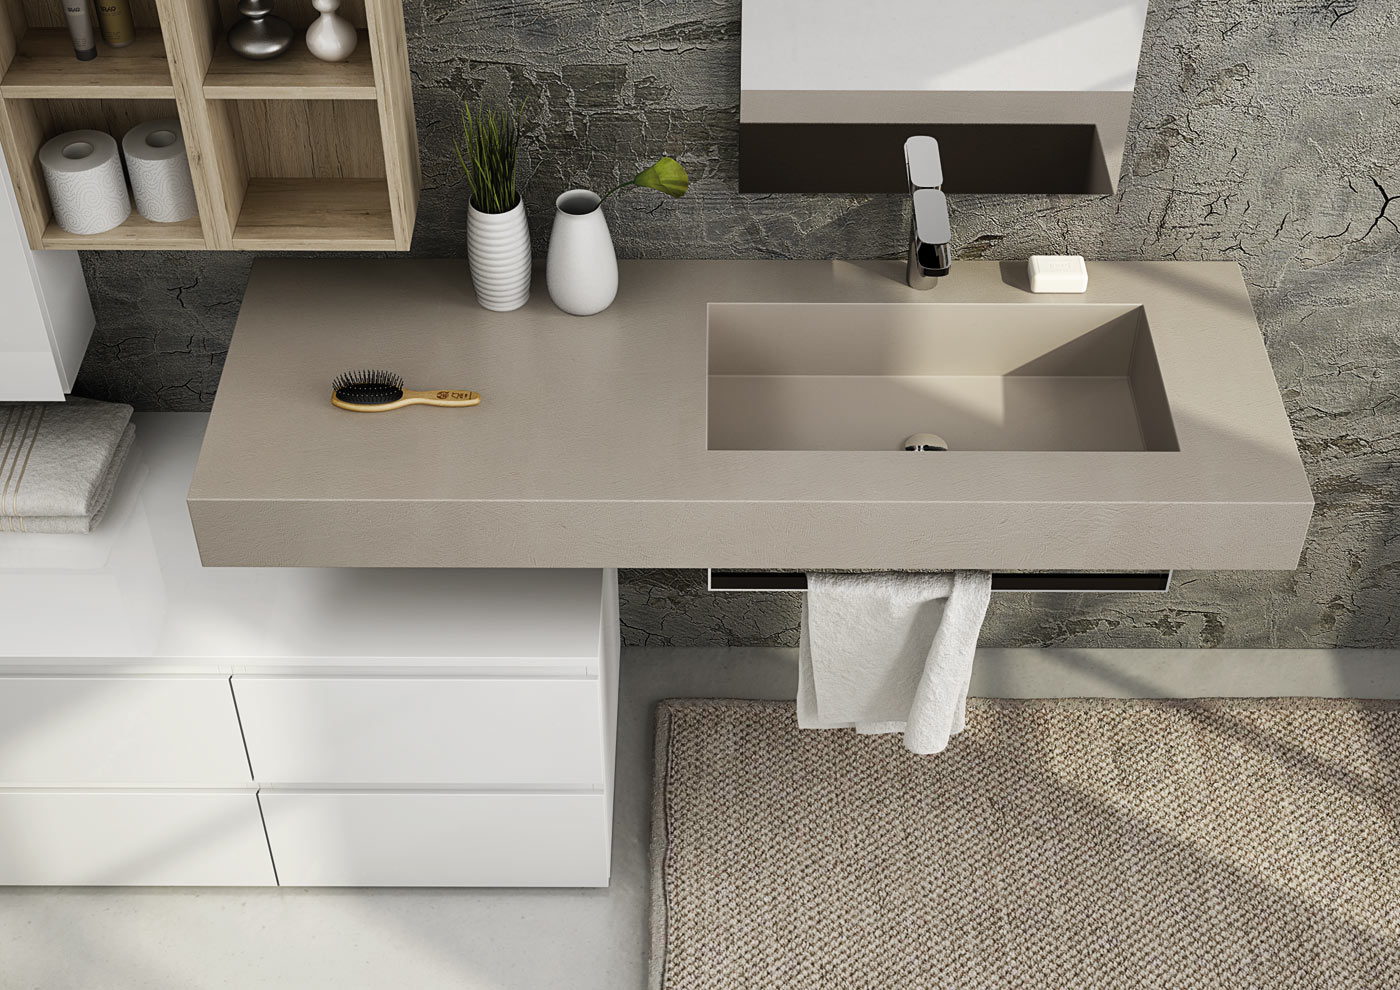 Mobile lavabo componibile singolo sospeso freedom 09 by - Lavabo bagno resina ...